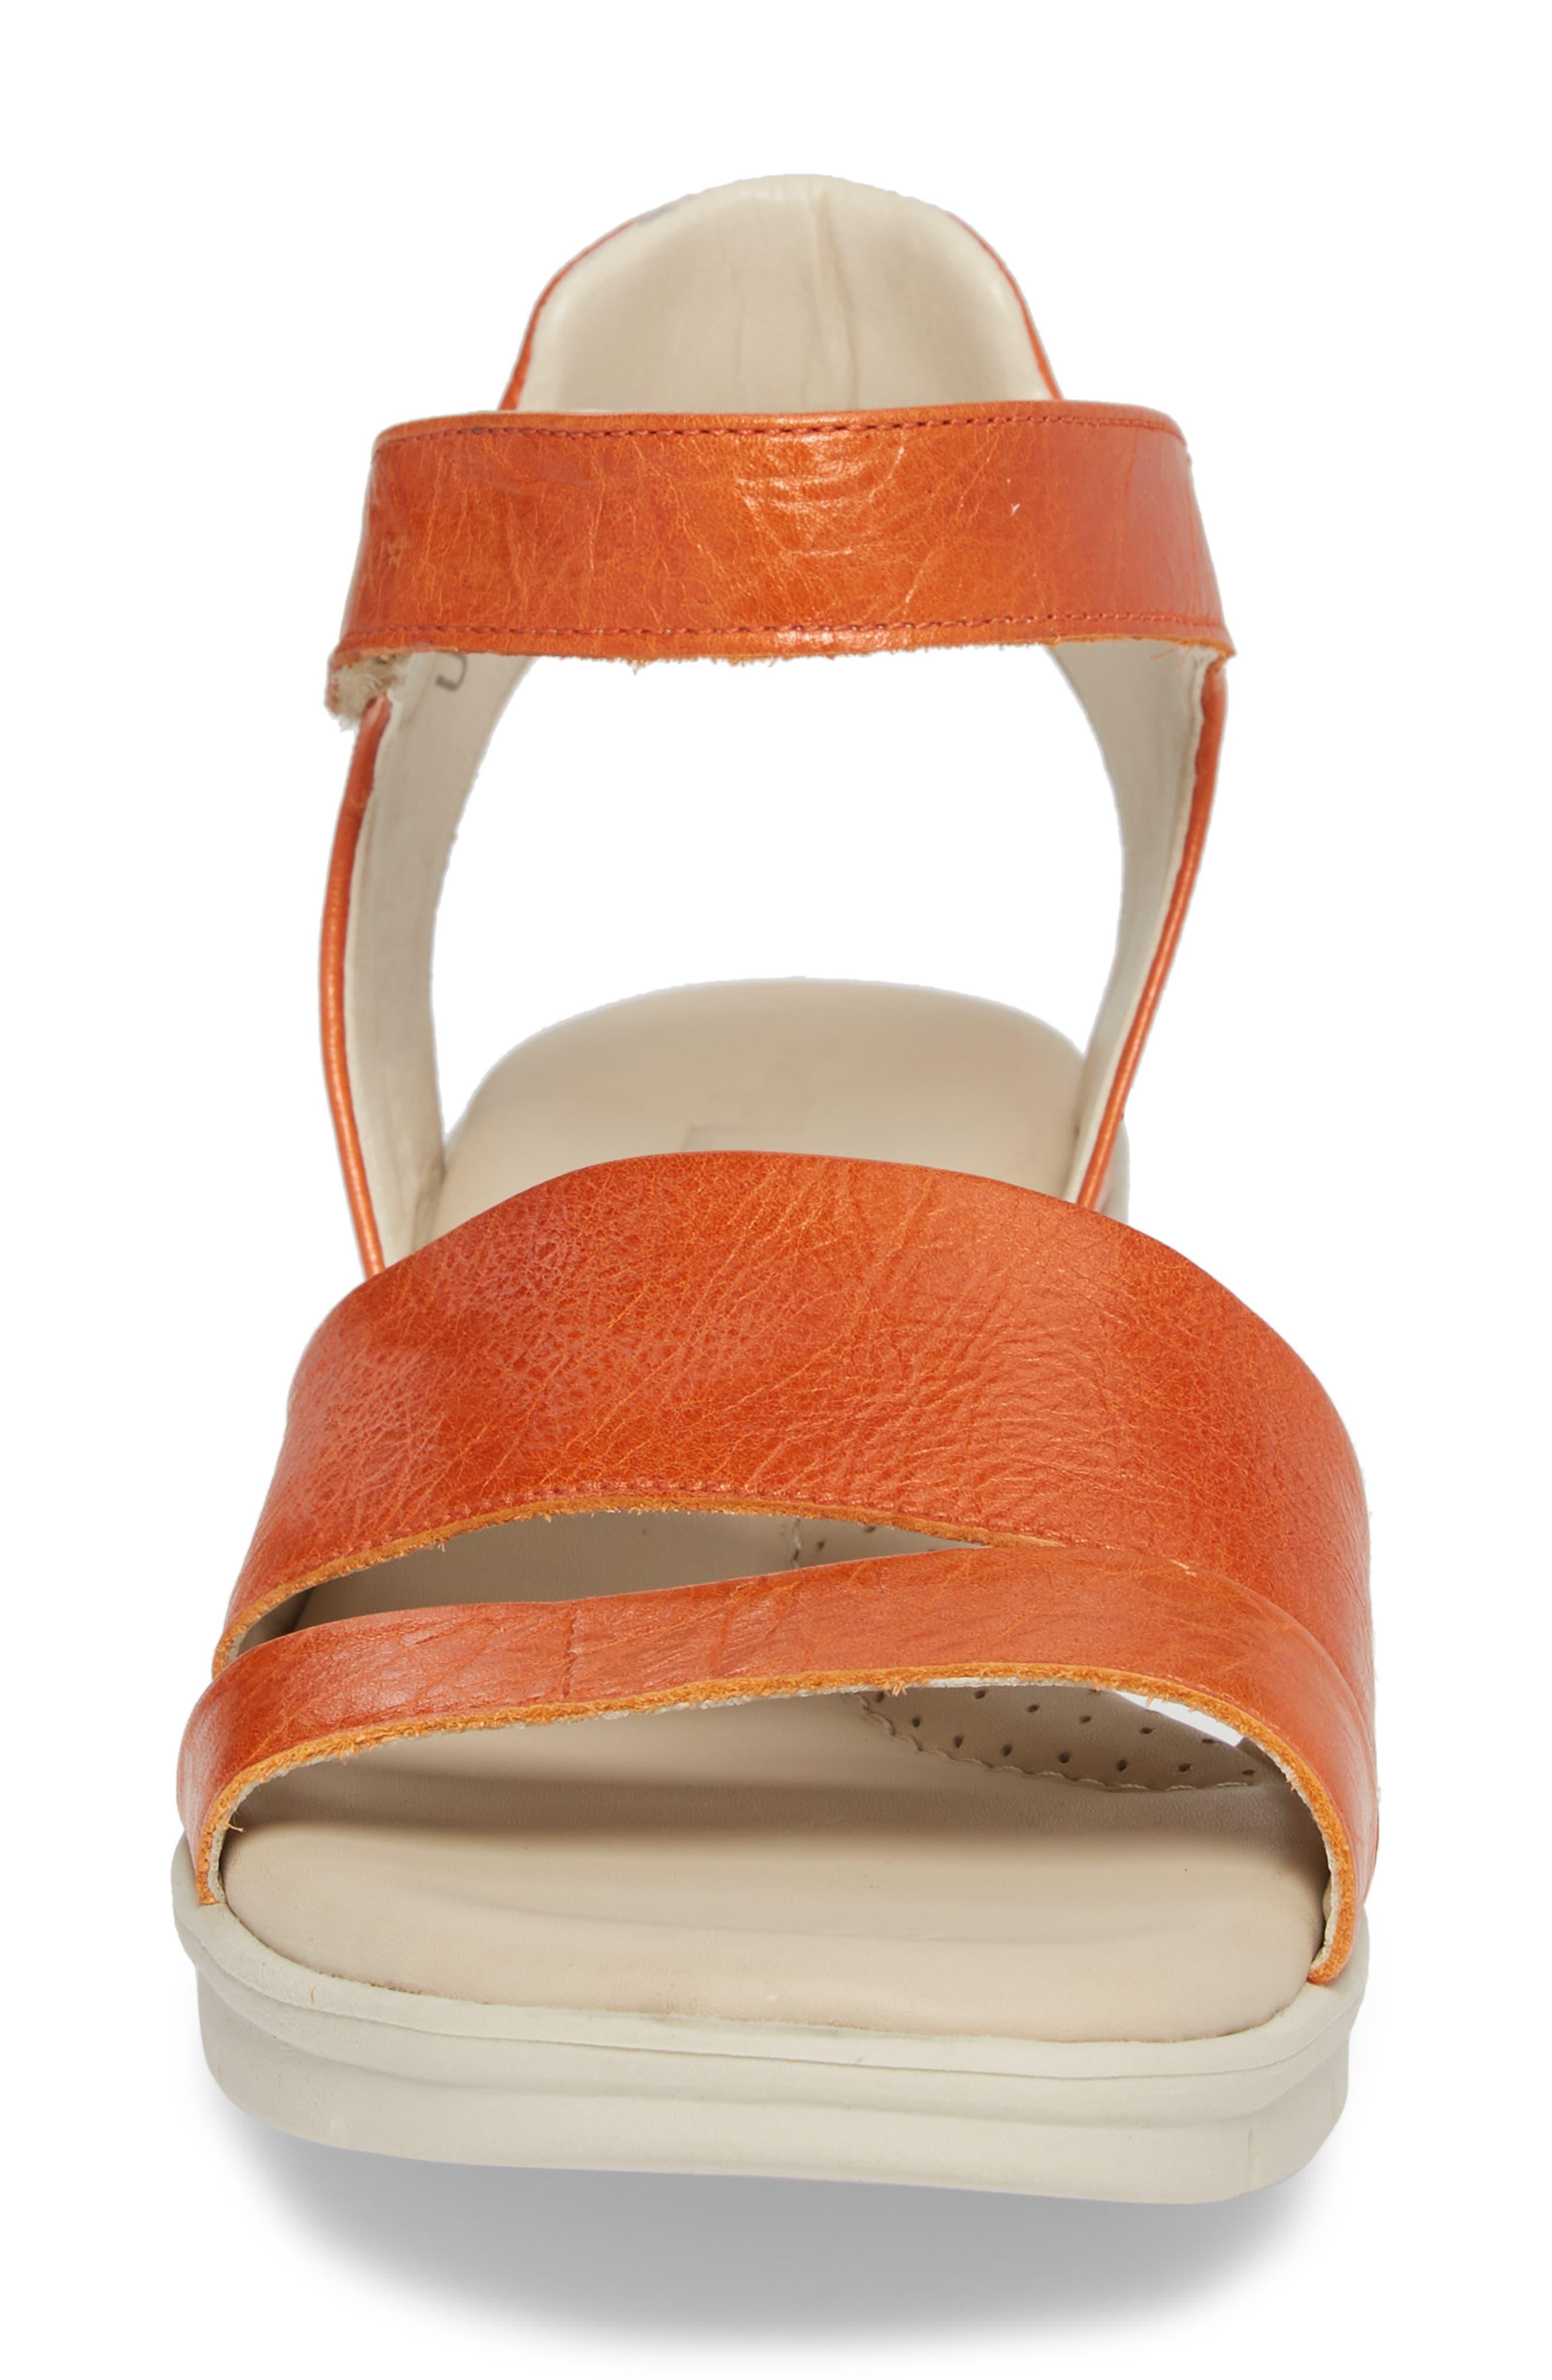 Crossover Ankle Strap Sandal,                             Alternate thumbnail 4, color,                             Mandarin Leather